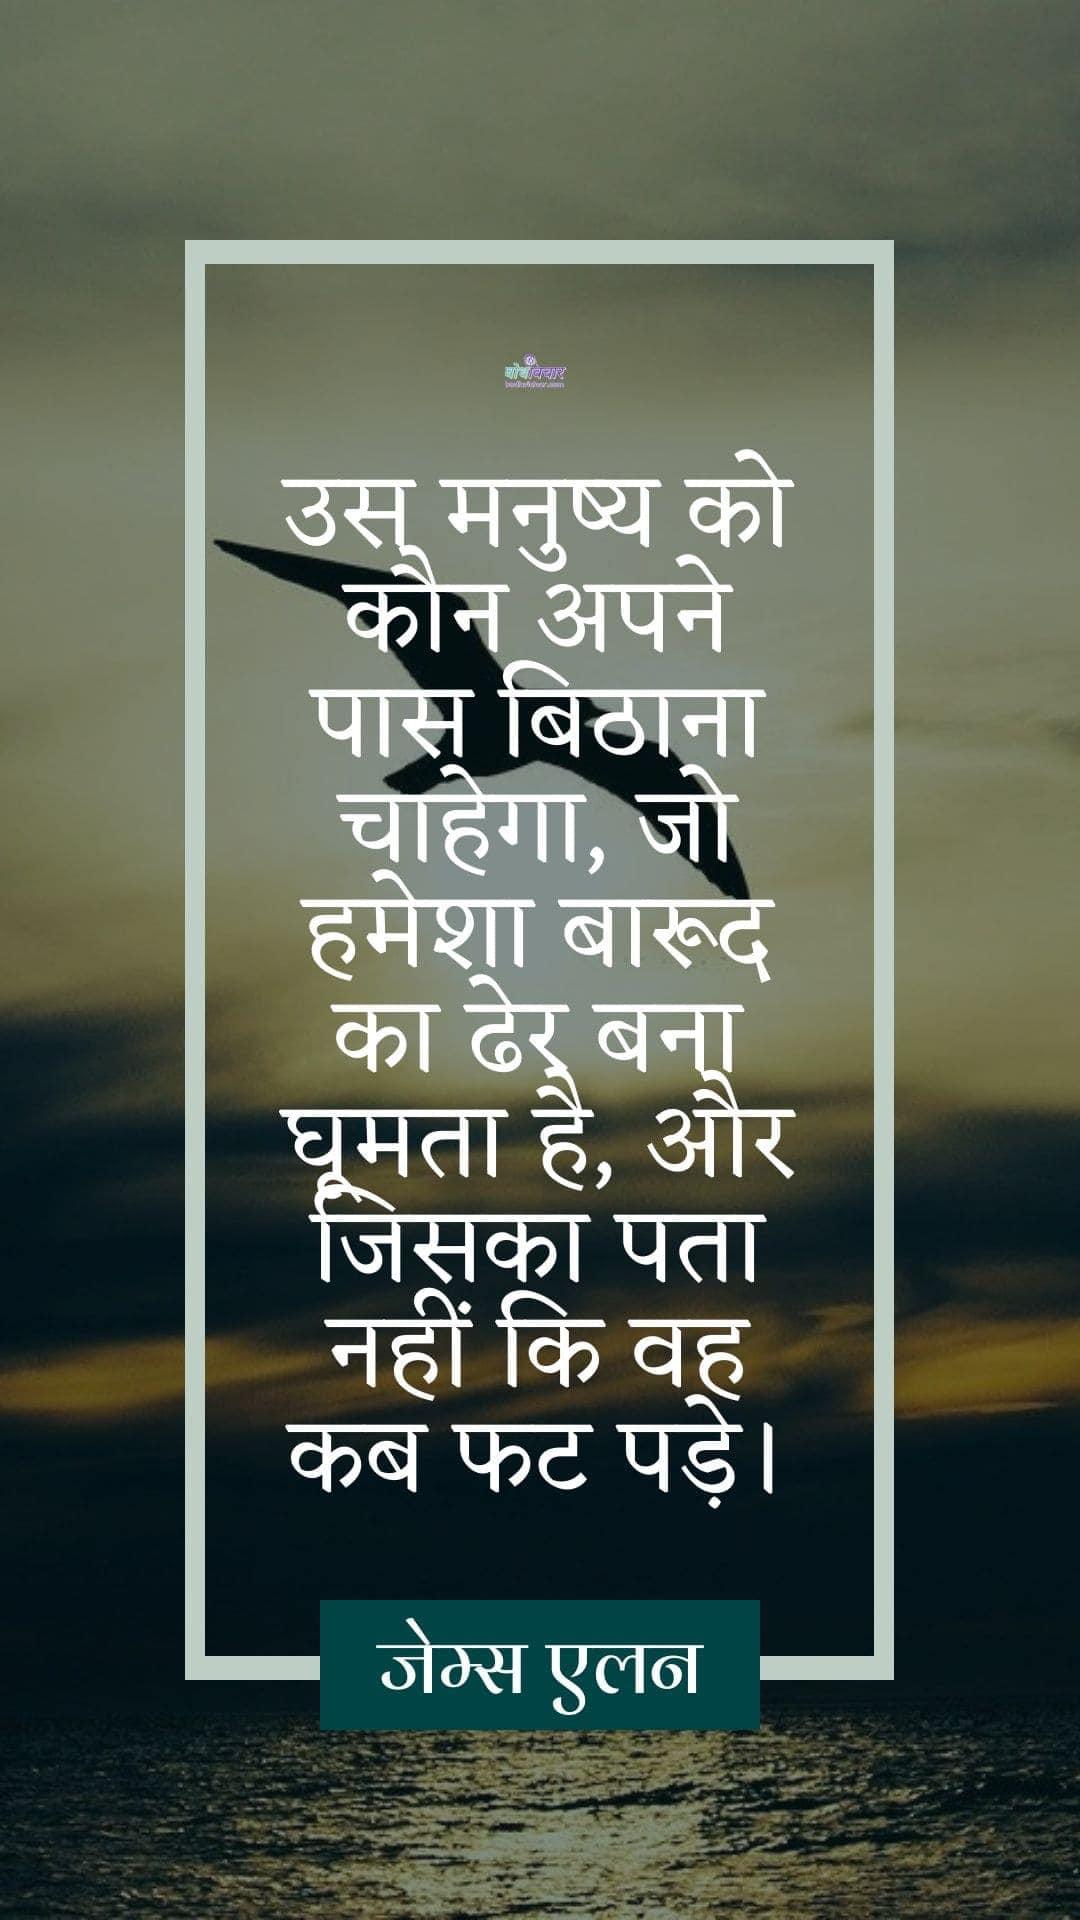 उस मनुष्य को कौन अपने पास बिठाना चाहेगा, जो हमेशा बारूद का ढेर बना घूमता है, और जिसका पता नहीं कि वह कब फट पड़े। : Us manushya ke paas kaun baithna chahega, us manushya ko kaun apne paas bithana chahega, jo hamesha barood ka dher bana rahta hai, jiska pata nahi kab phoot pade. - जेम्स एलन